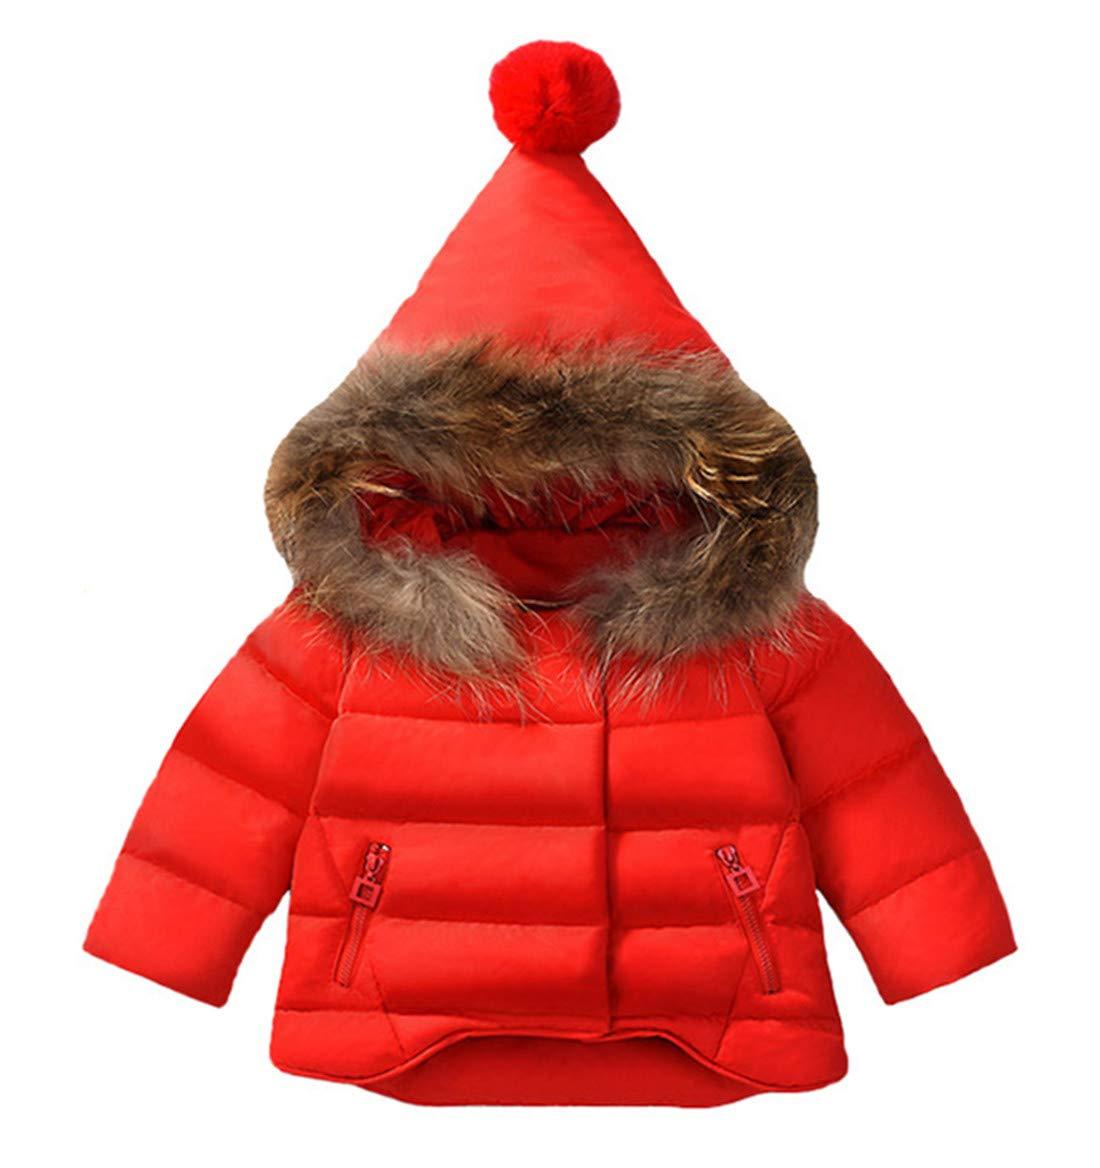 Baby Girls Thicken Coat Thermal Hooded Winter Snowsuit Waterproof Lightweight Warm Cotton Jacket Red 90 by Xuvozta